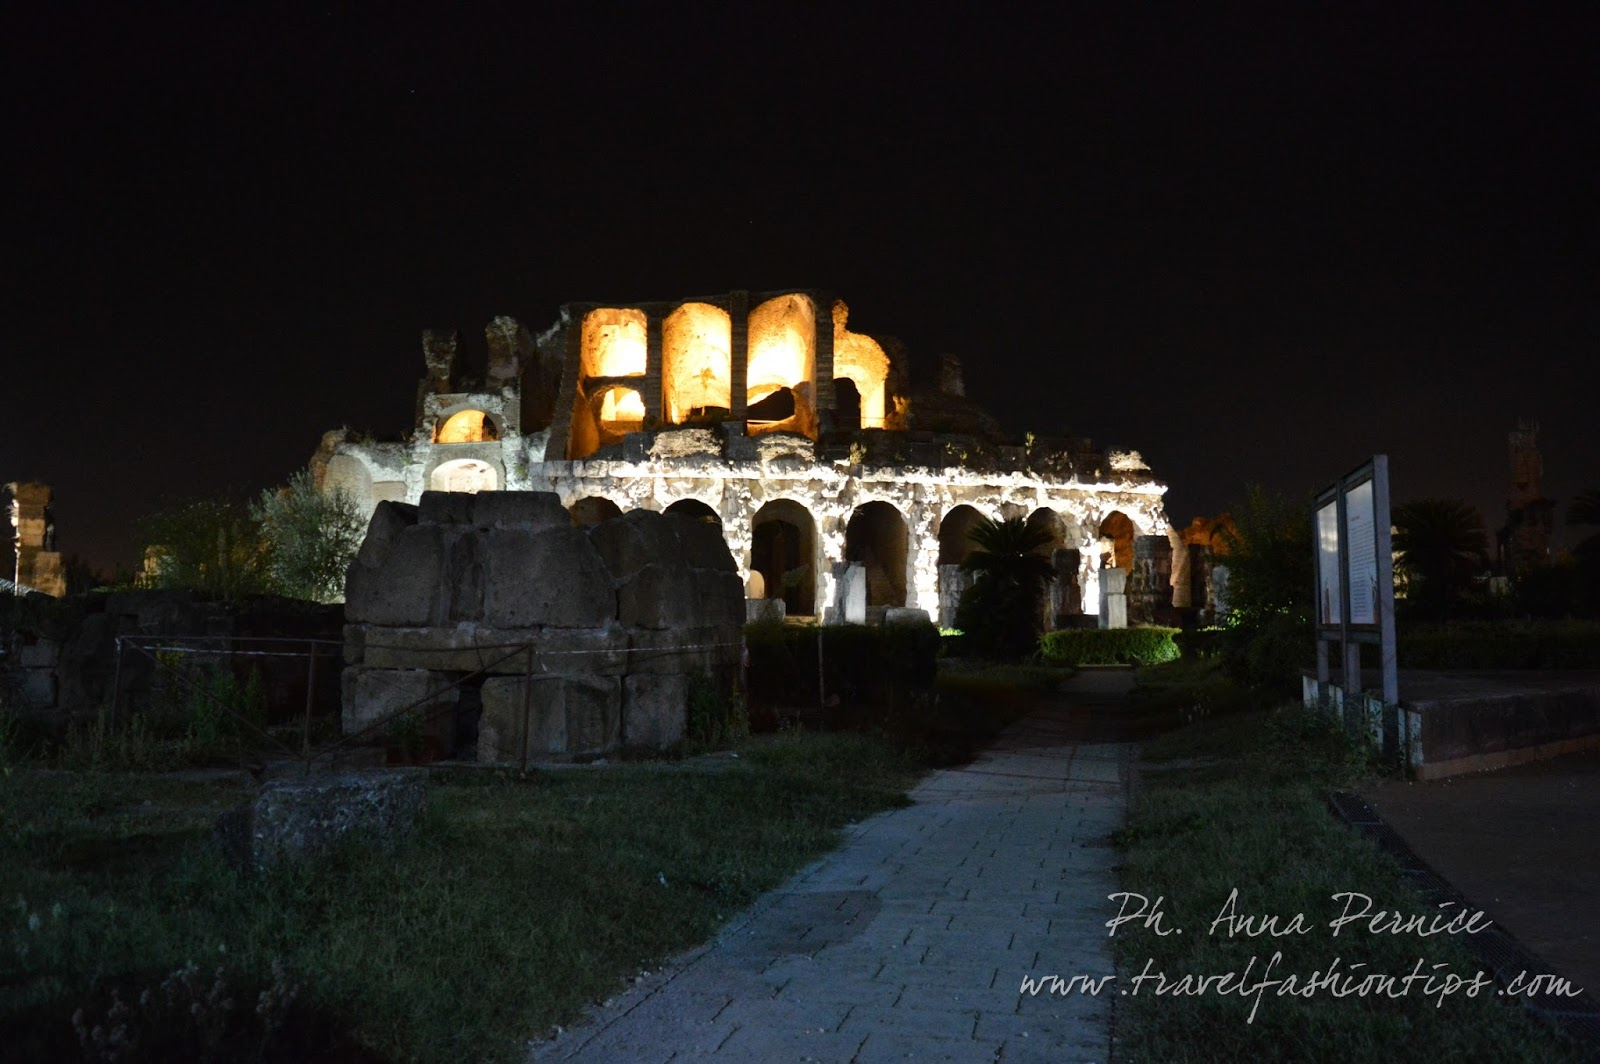 L anfiteatro campano di santa maria capua vetere - Piscina santa maria capua vetere ...